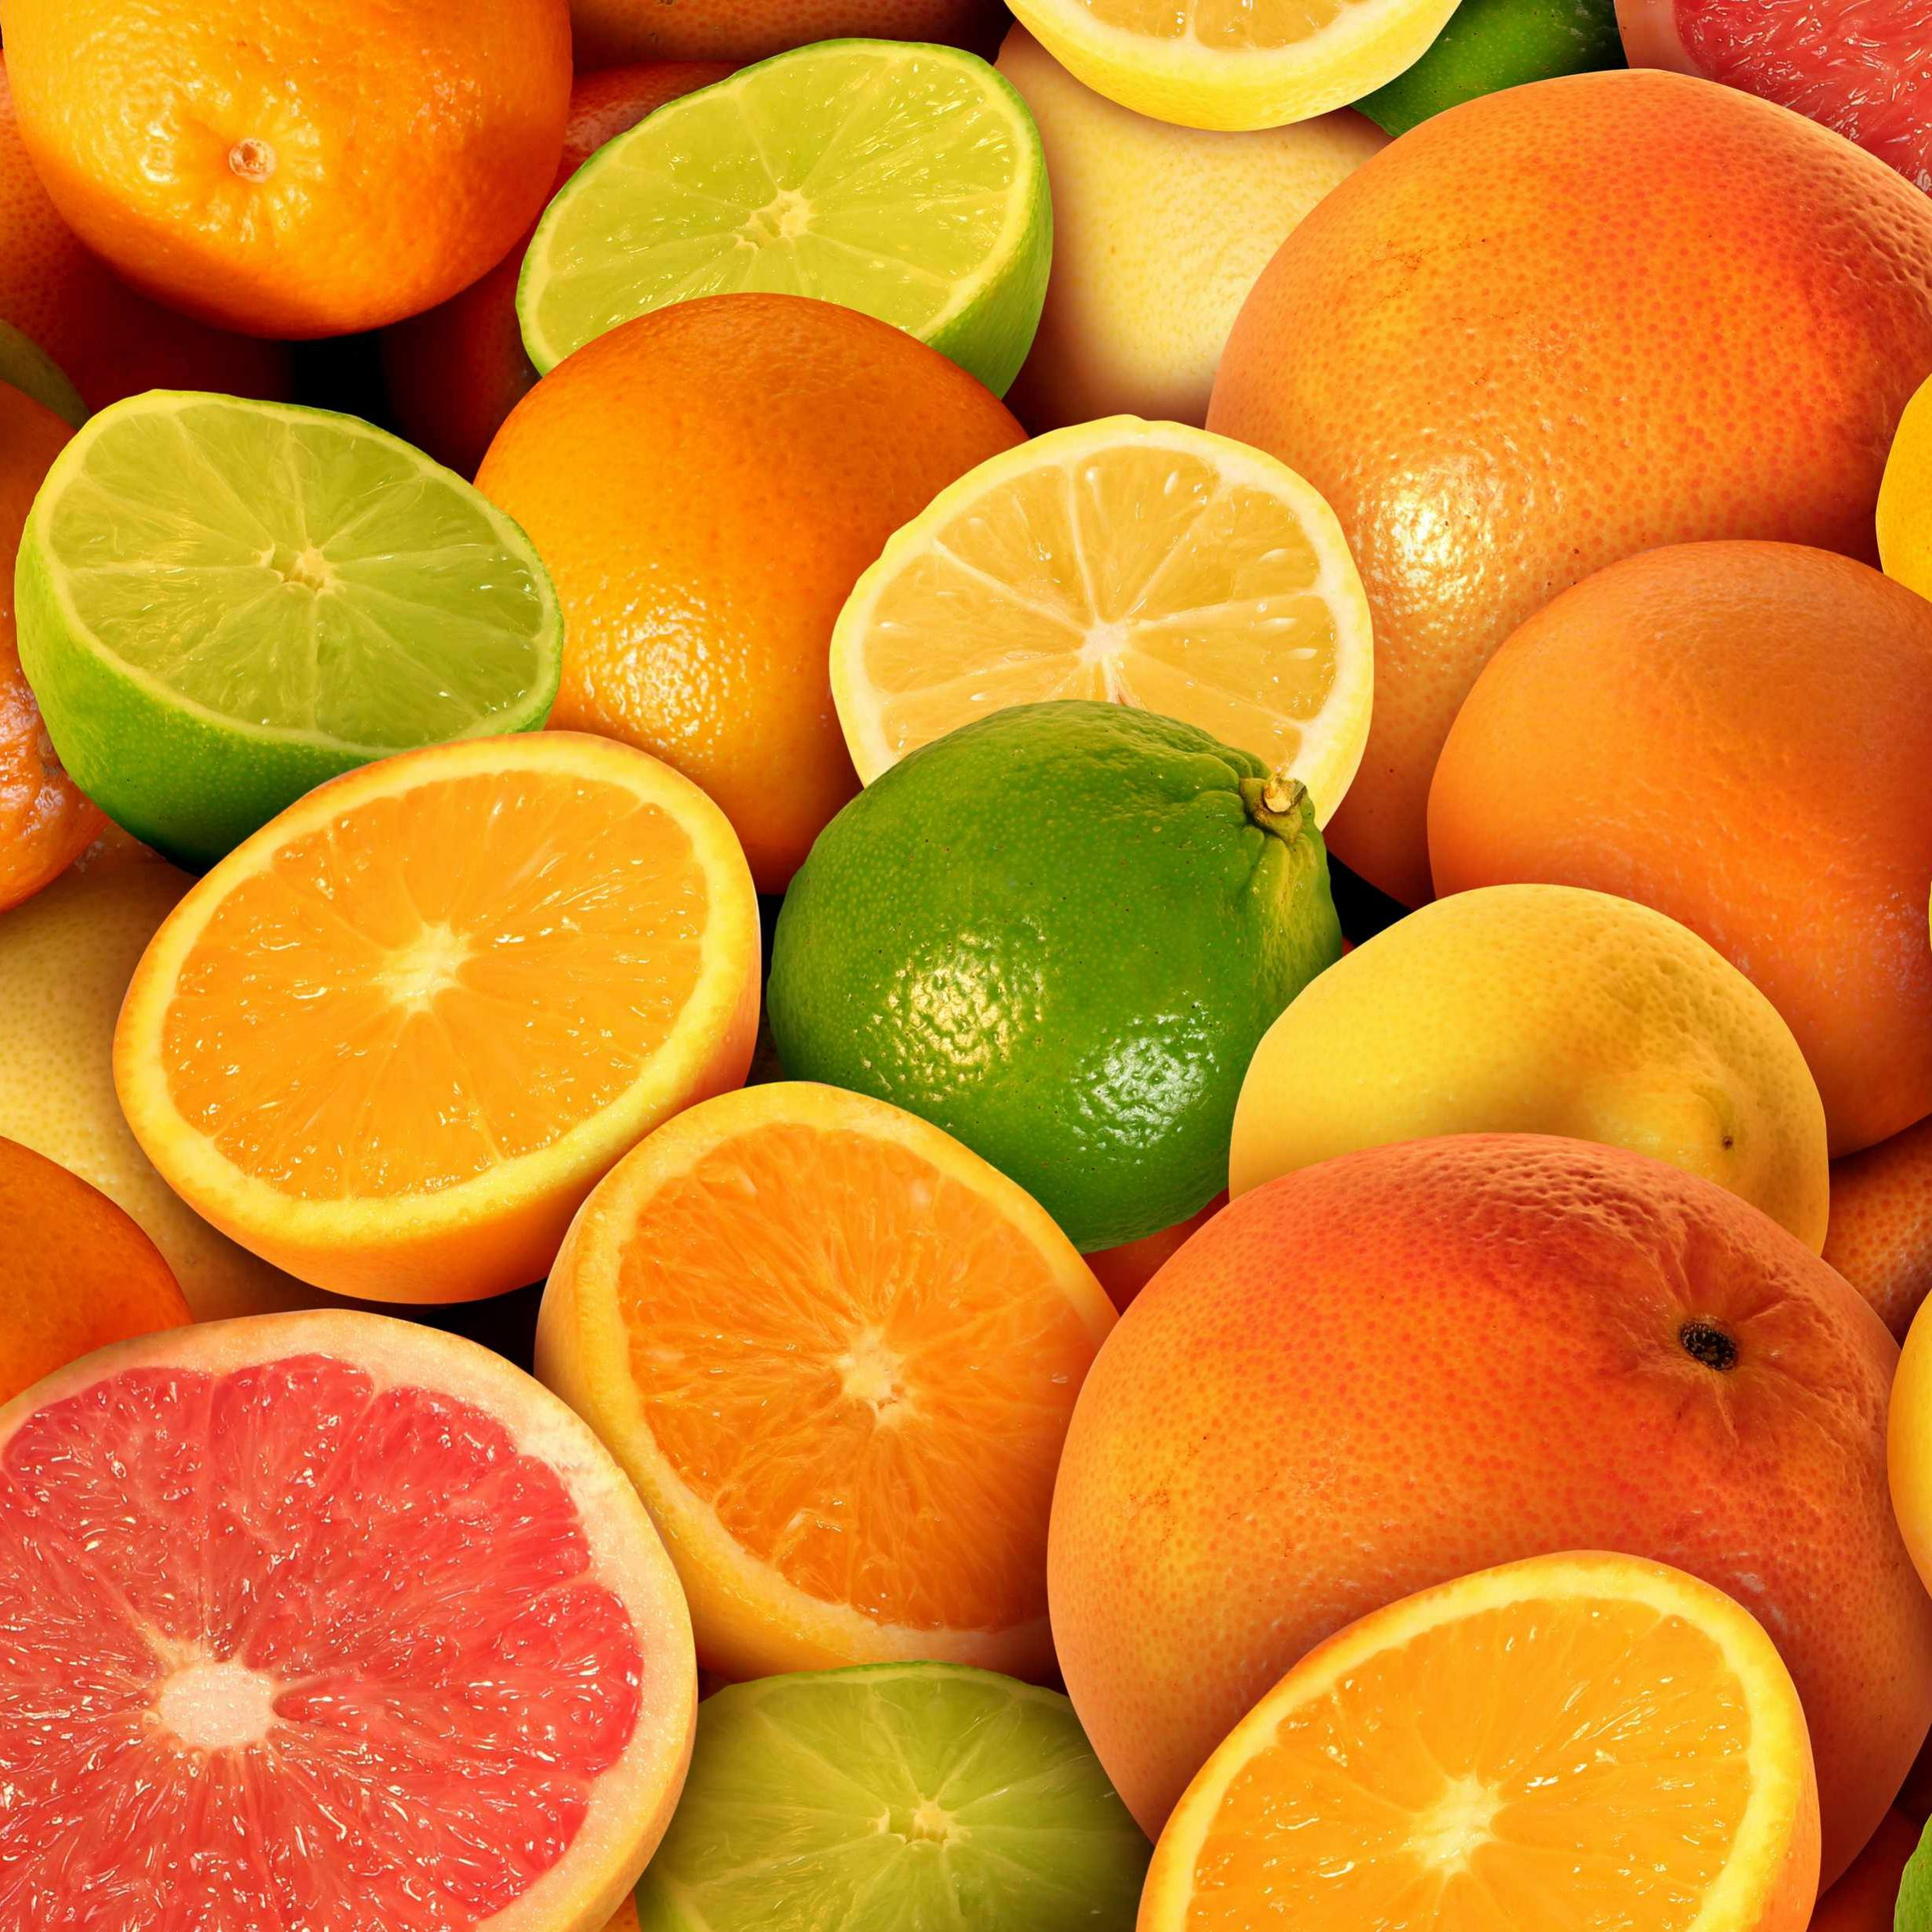 a pile of citrus fruits, oranges, lemons, limes and grapefruits